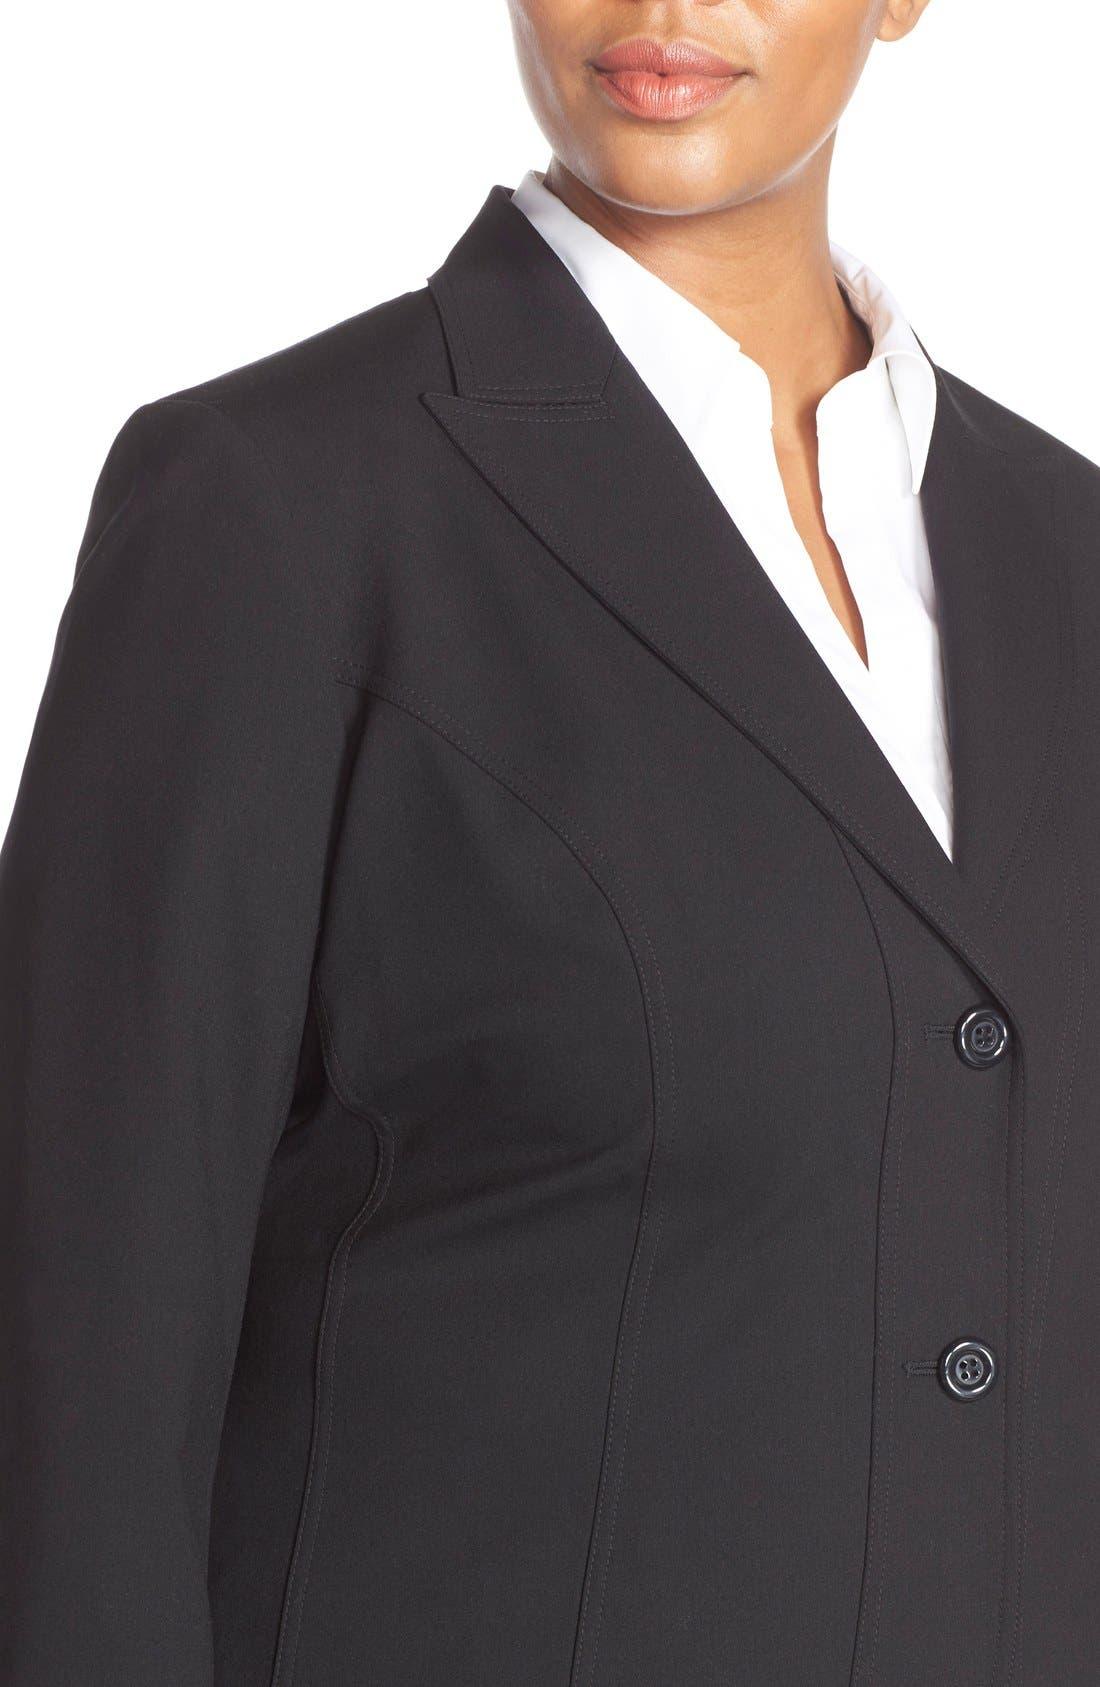 Alternate Image 3  - Lafayette 148 New York 'Gladstone' Stretch Wool Jacket (Plus Size) (Nordstrom Exclusive)